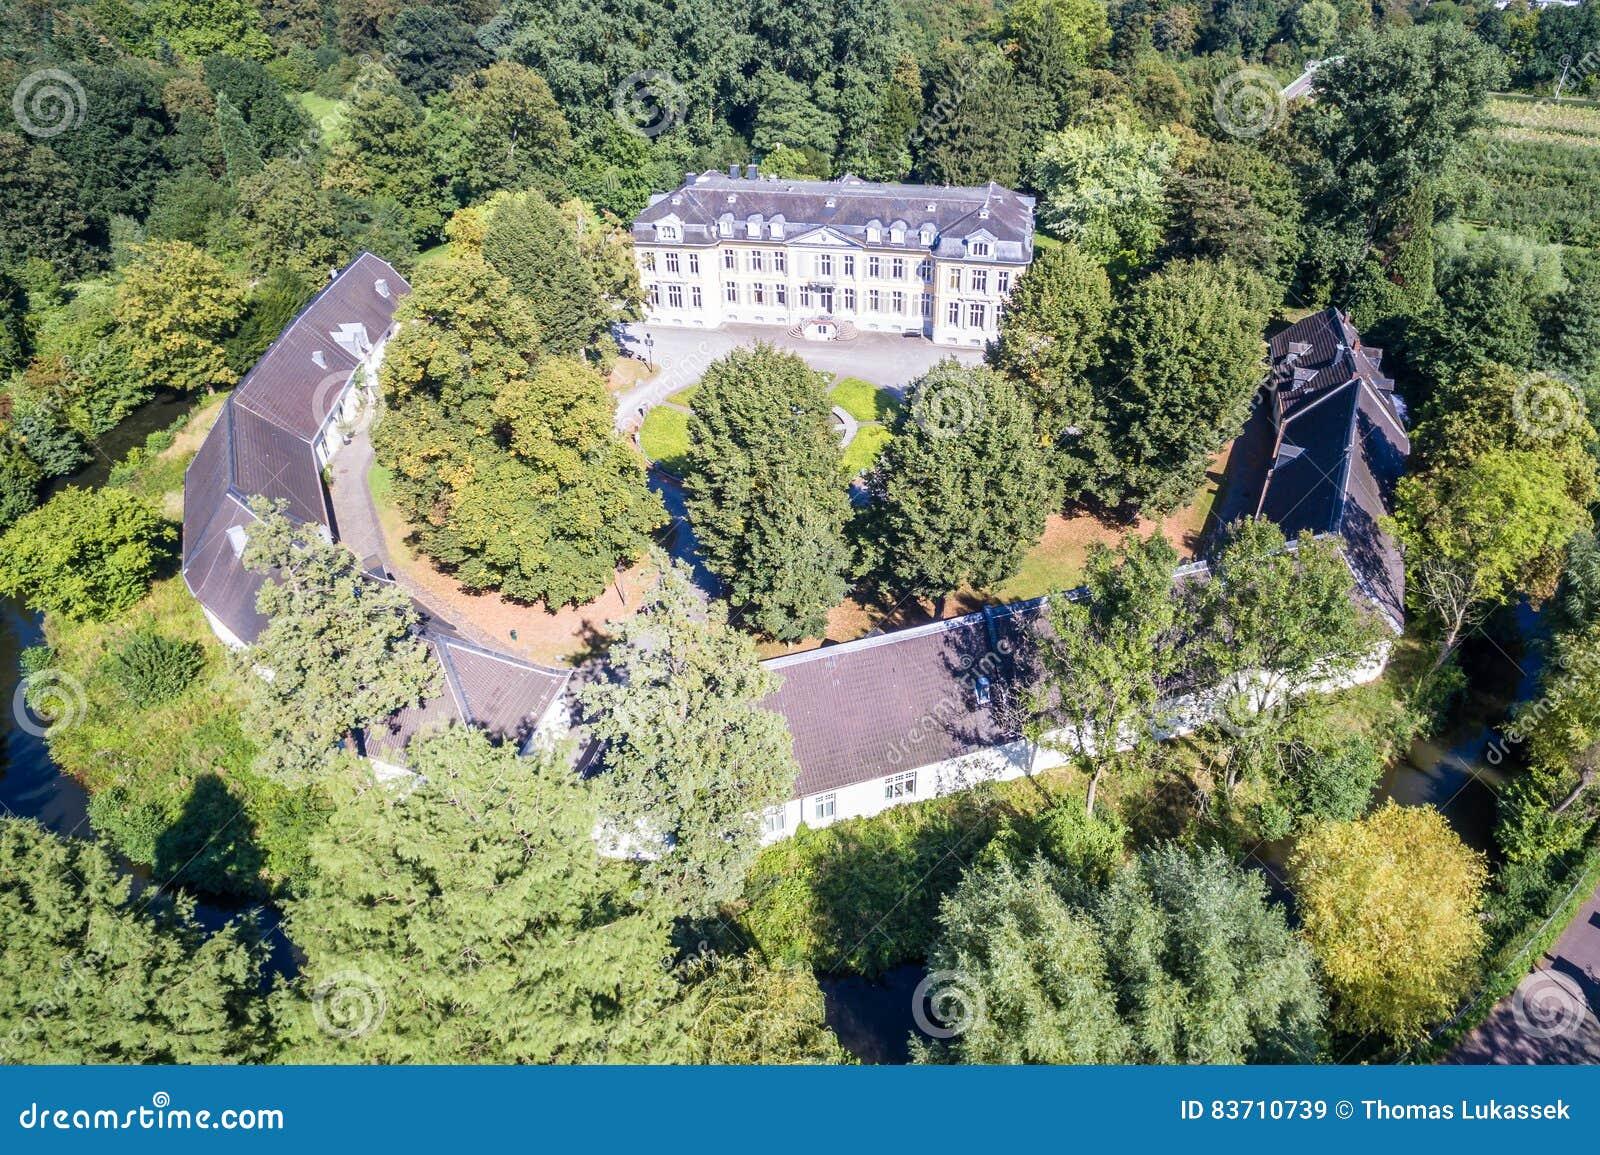 Vogelperspektive des Schlosses Morsbroich in Leverkusen